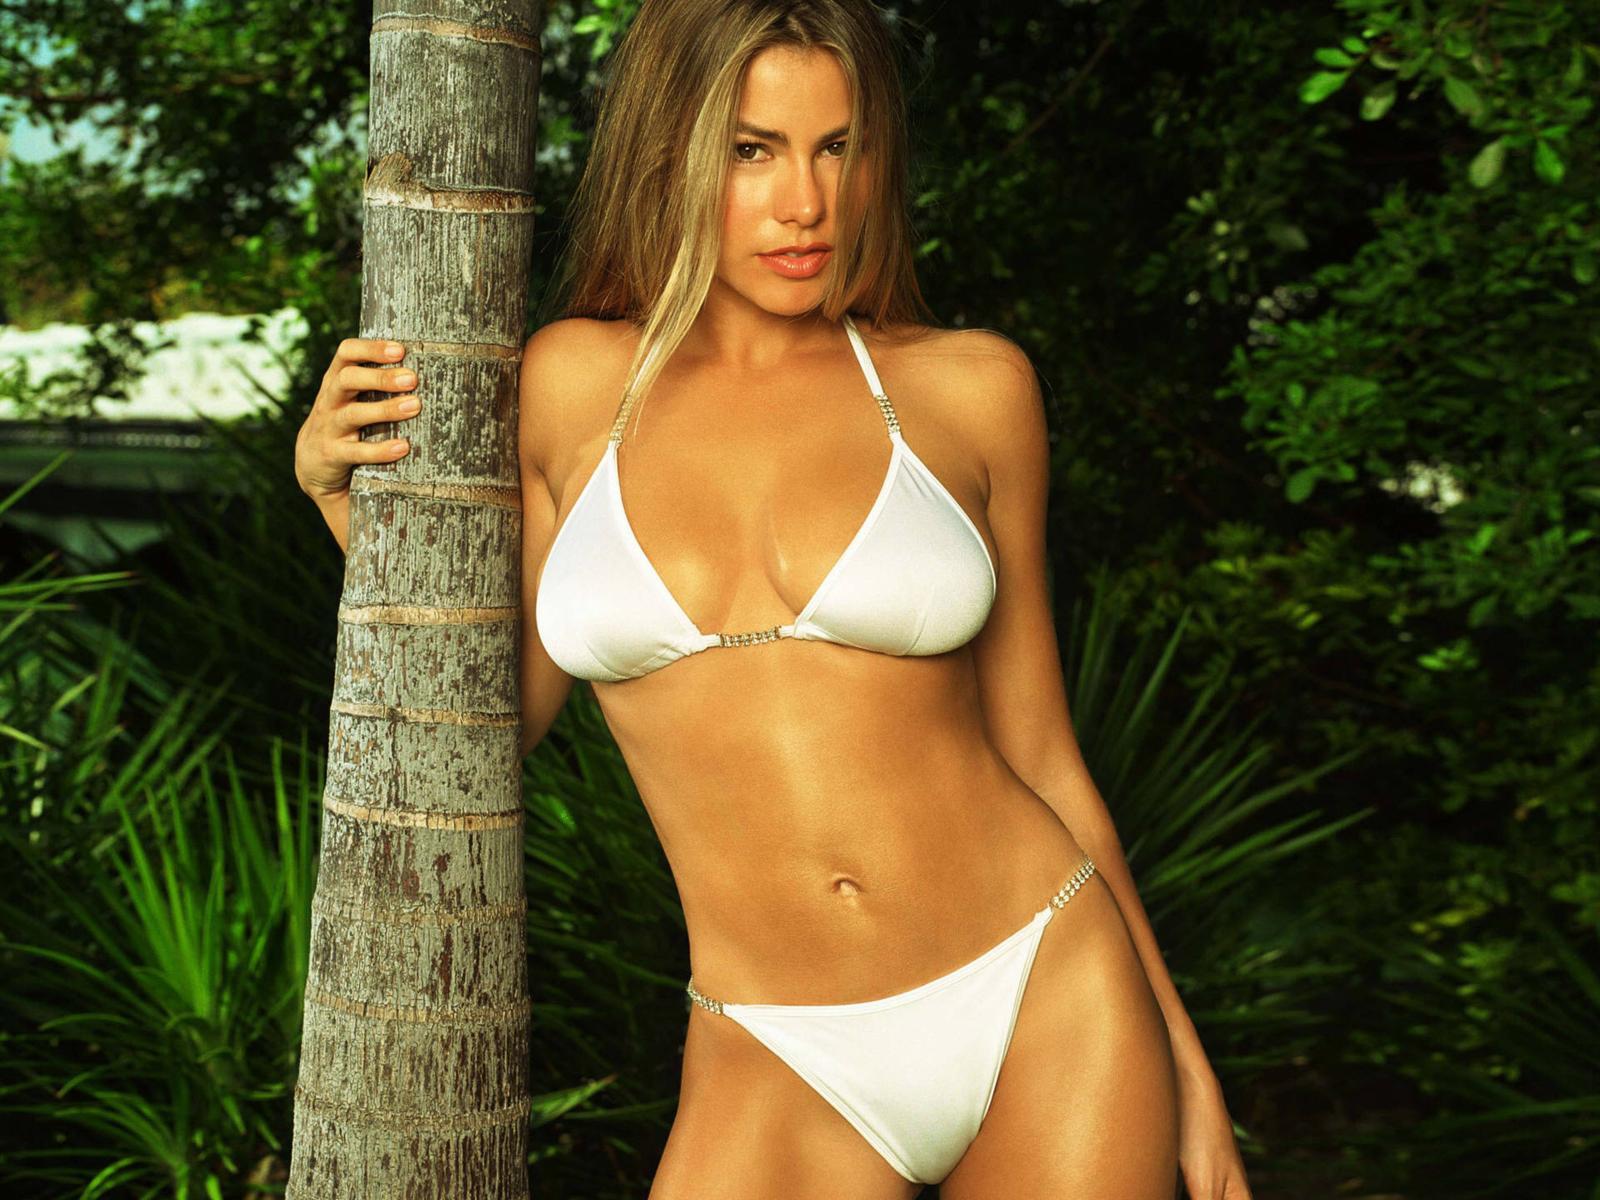 http://4.bp.blogspot.com/-Mva5M1bDyi8/TZ-paprRmaI/AAAAAAAABVw/YZH6ynM0HJs/s1600/sofia_vergara_white_bikini_desktop_wallpaper_48056.jpg